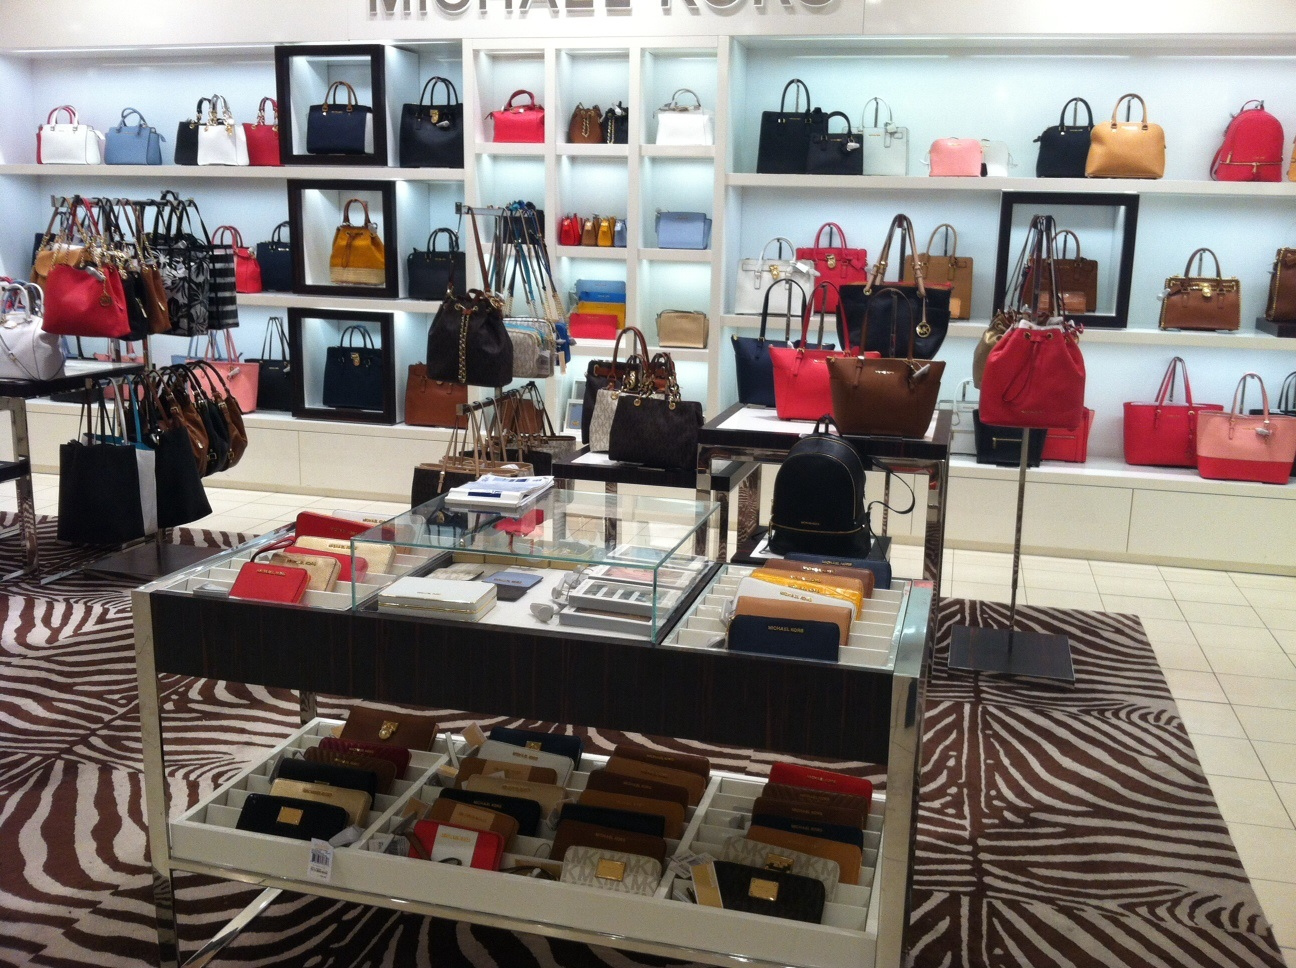 MICHAEL by Michael Kors - сумки, женская одежда, обувь, и